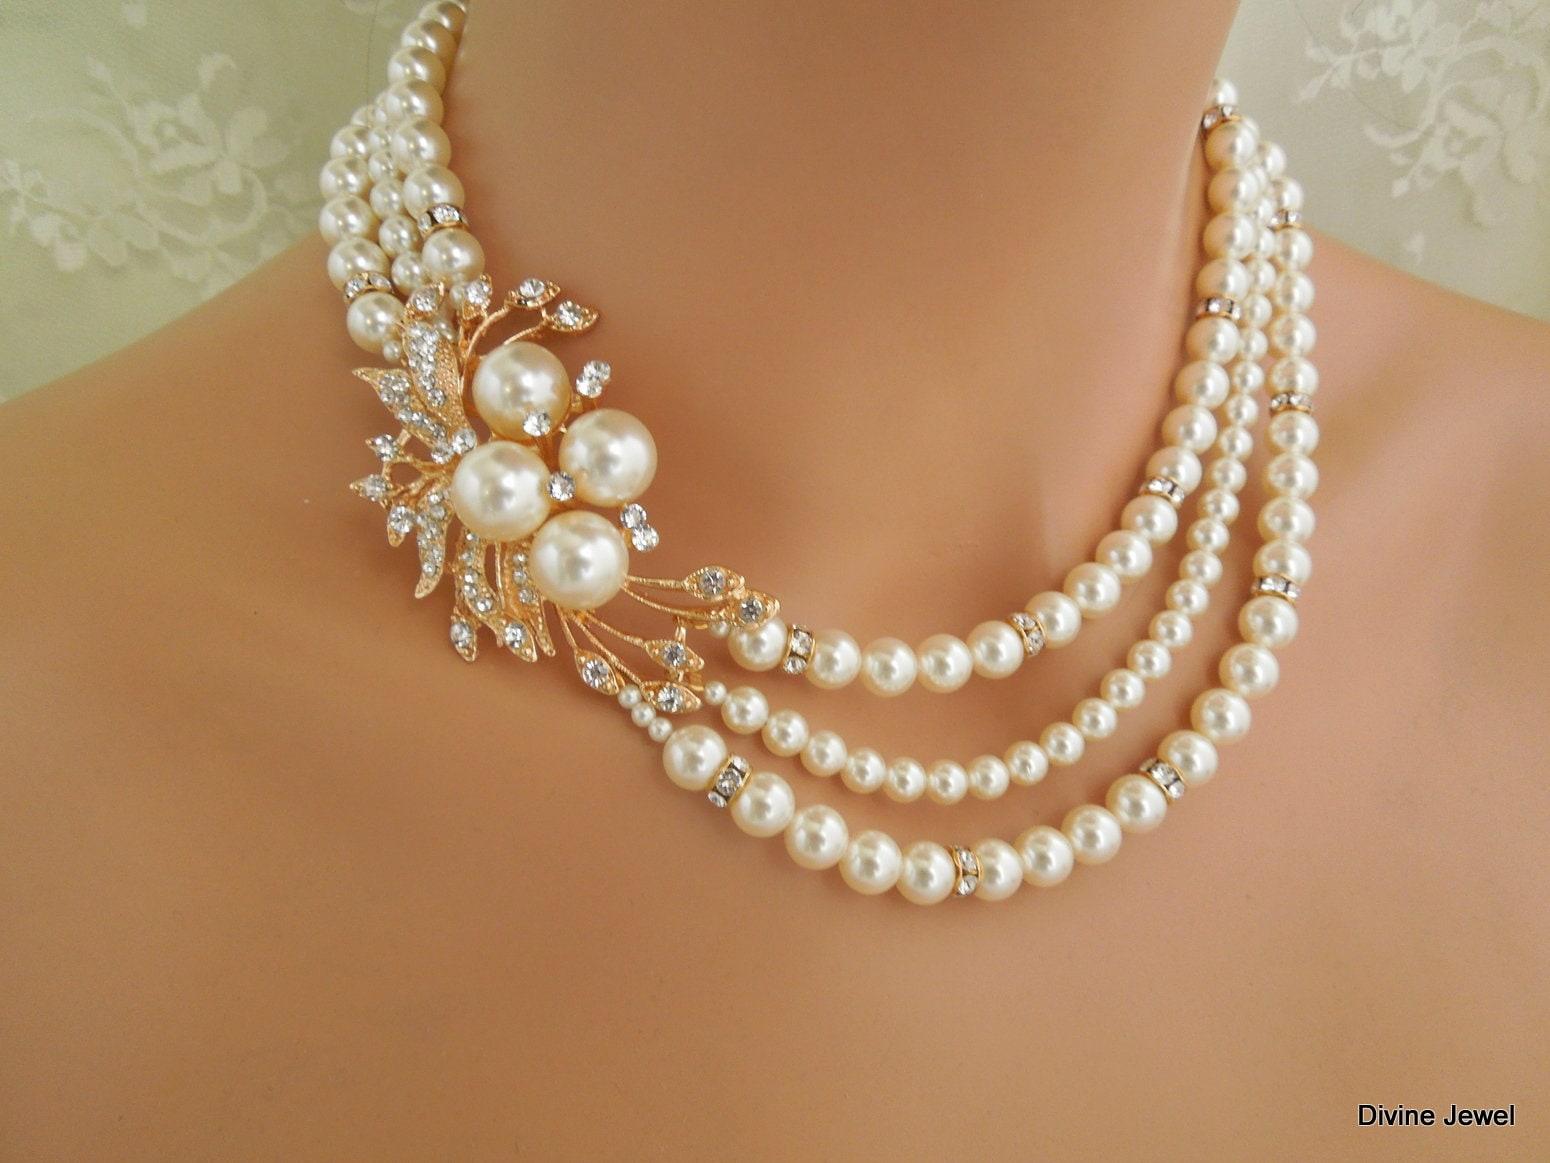 rhinestone necklace wedding necklace pearl ROSELANI pearl necklace bridal Pearl Necklace vintage style wedding rhinestone Necklace